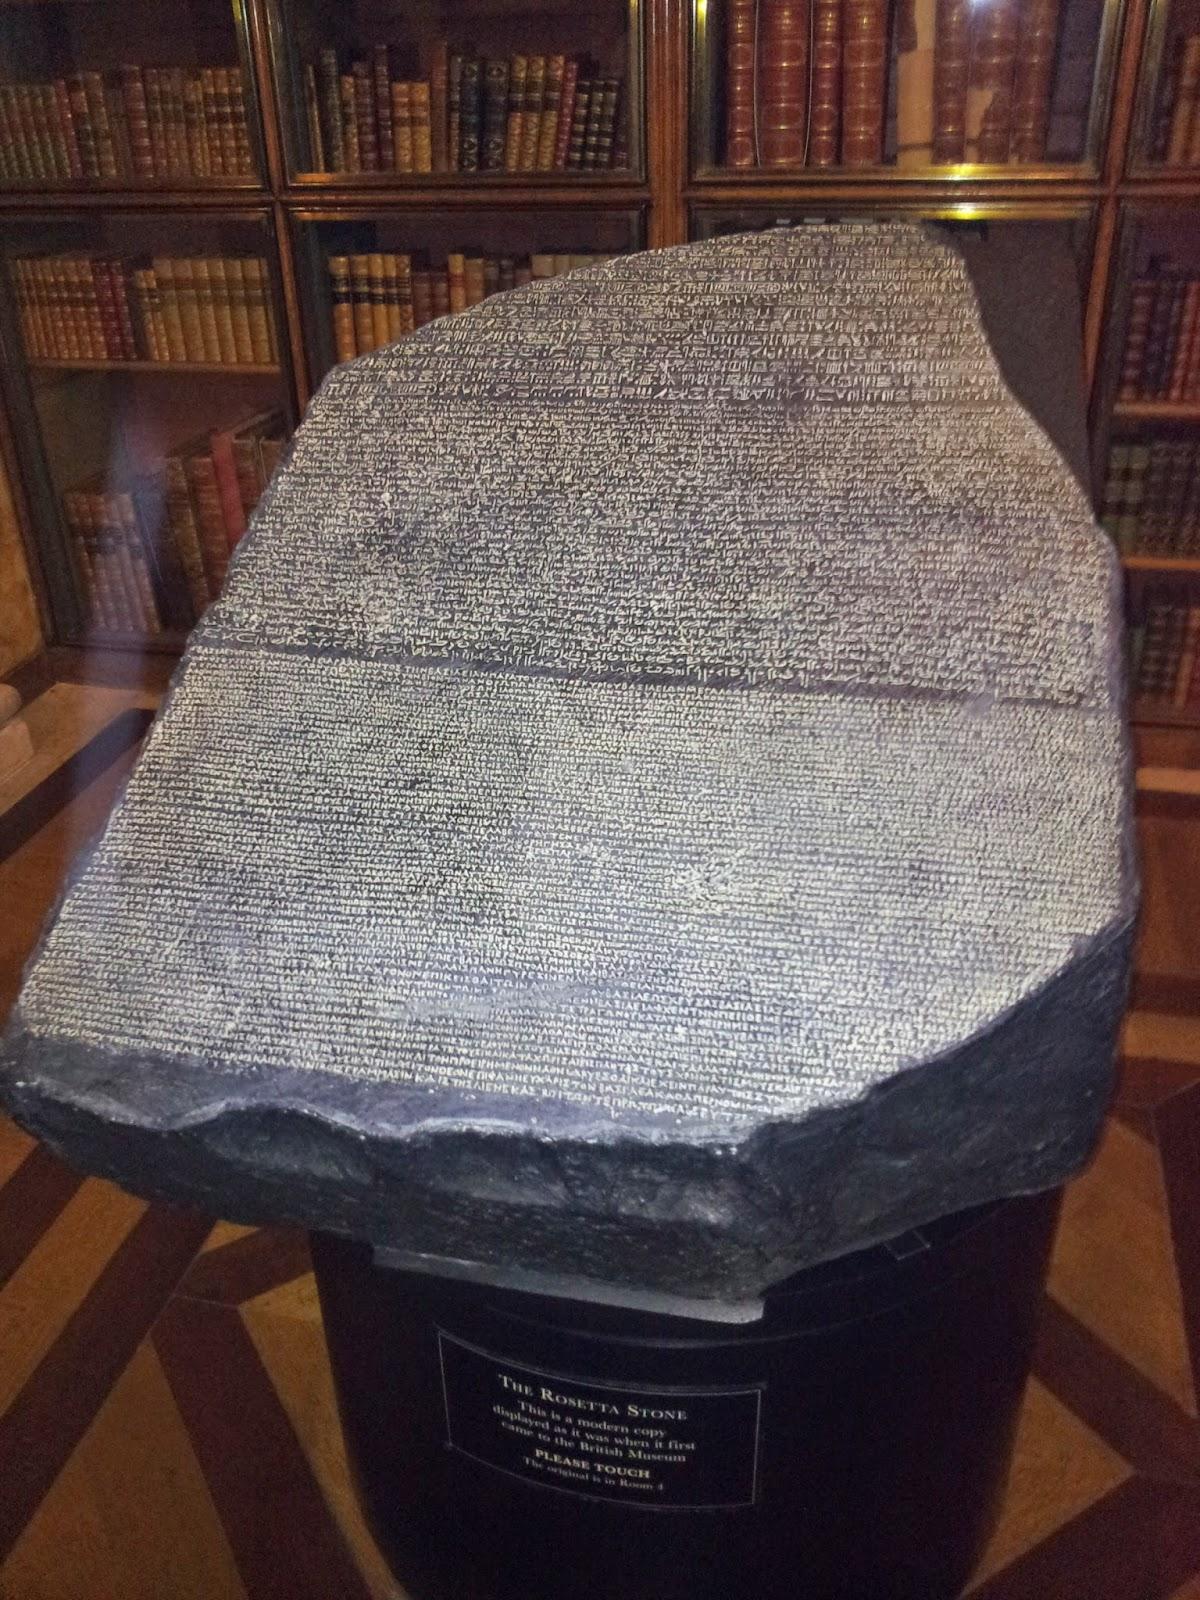 la pierre de rosette l 39 gypte r v l ele m dia tv. Black Bedroom Furniture Sets. Home Design Ideas